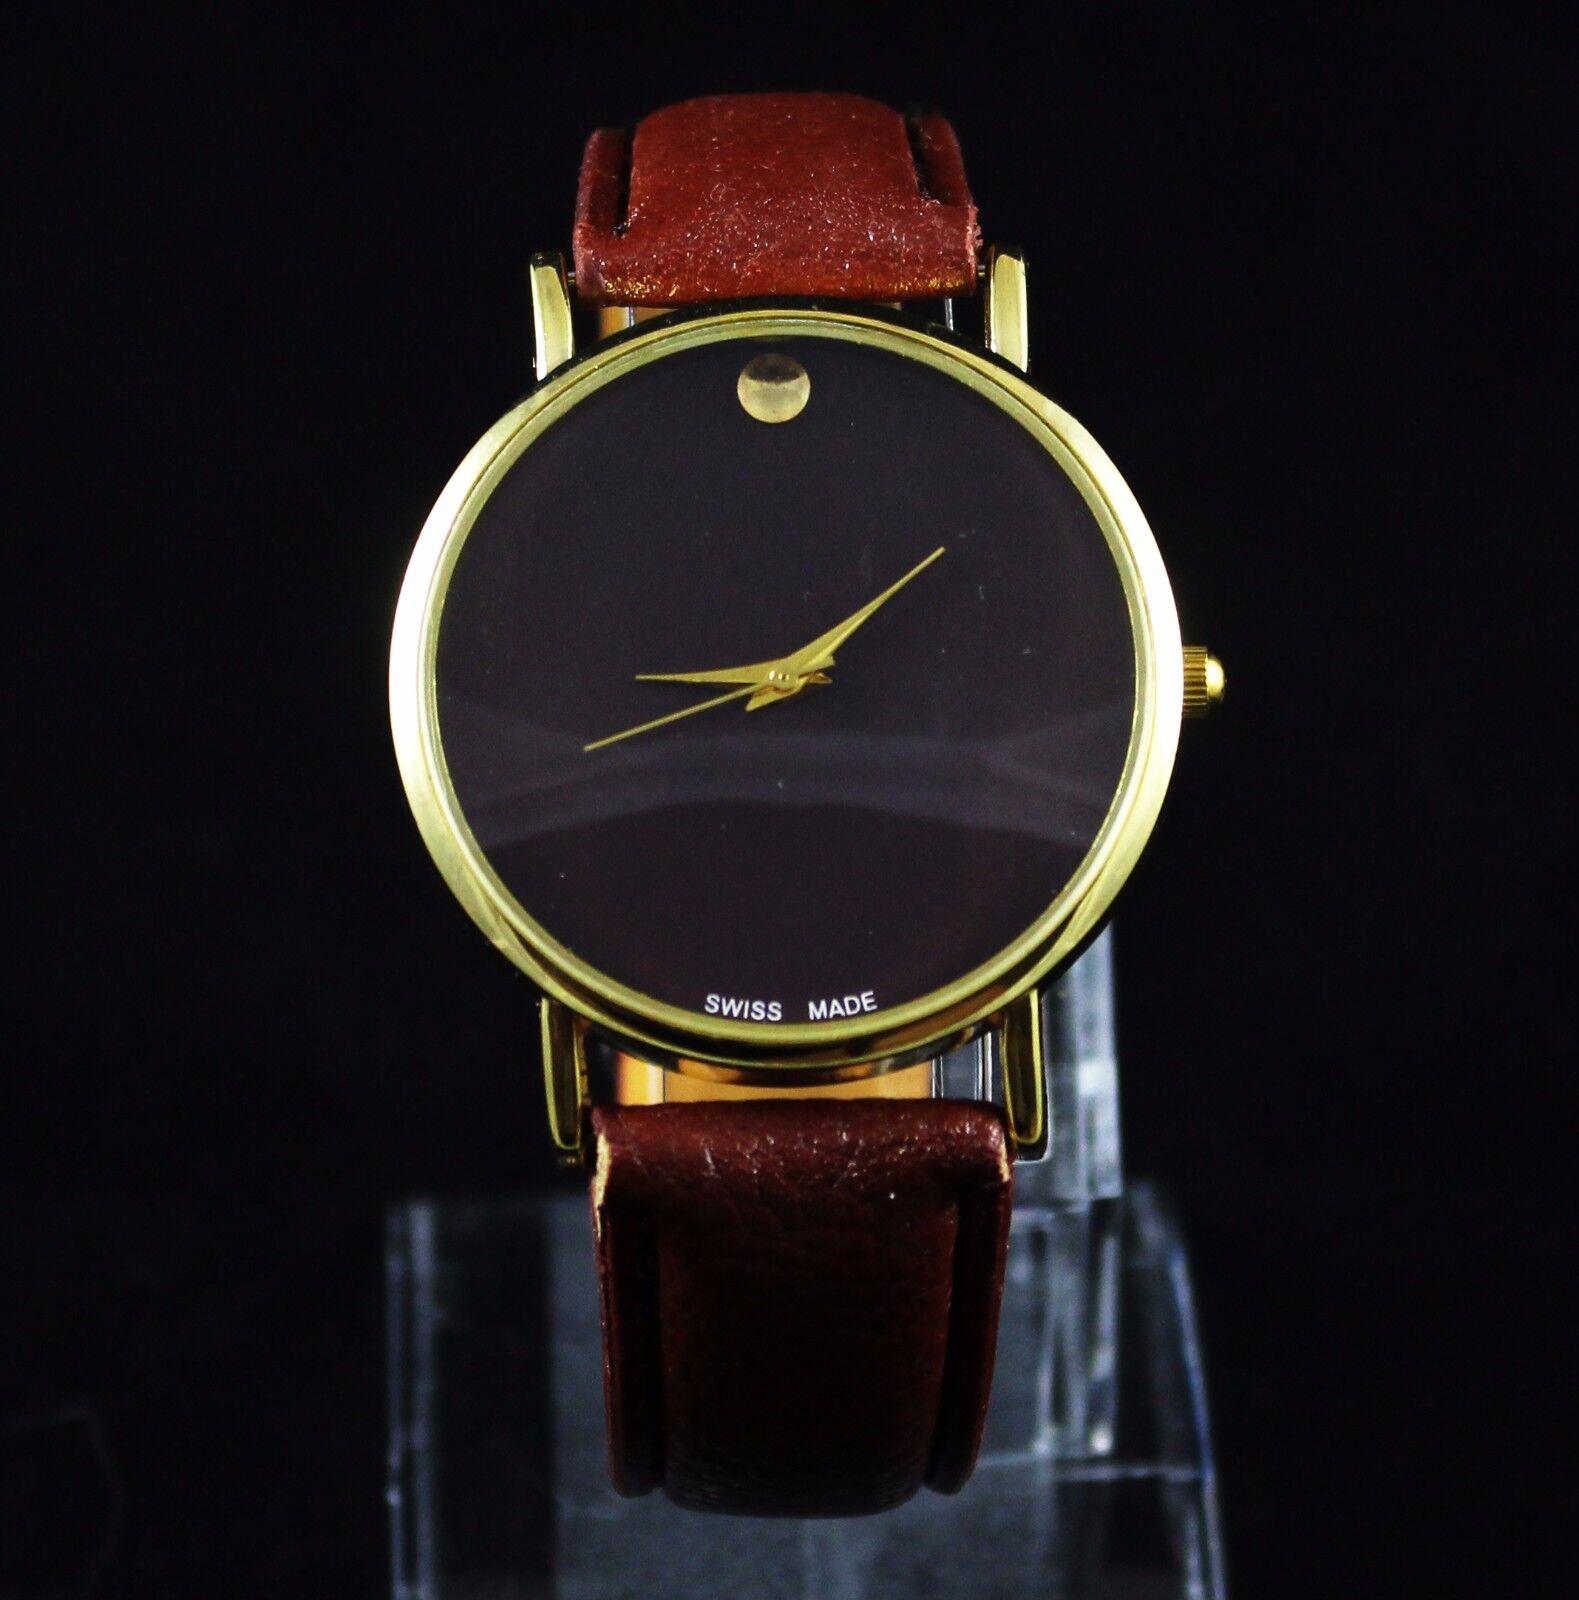 $6.99 - New Men's Classic Leather Fashion Designer Inspired Luxury Wrist Watch Watches